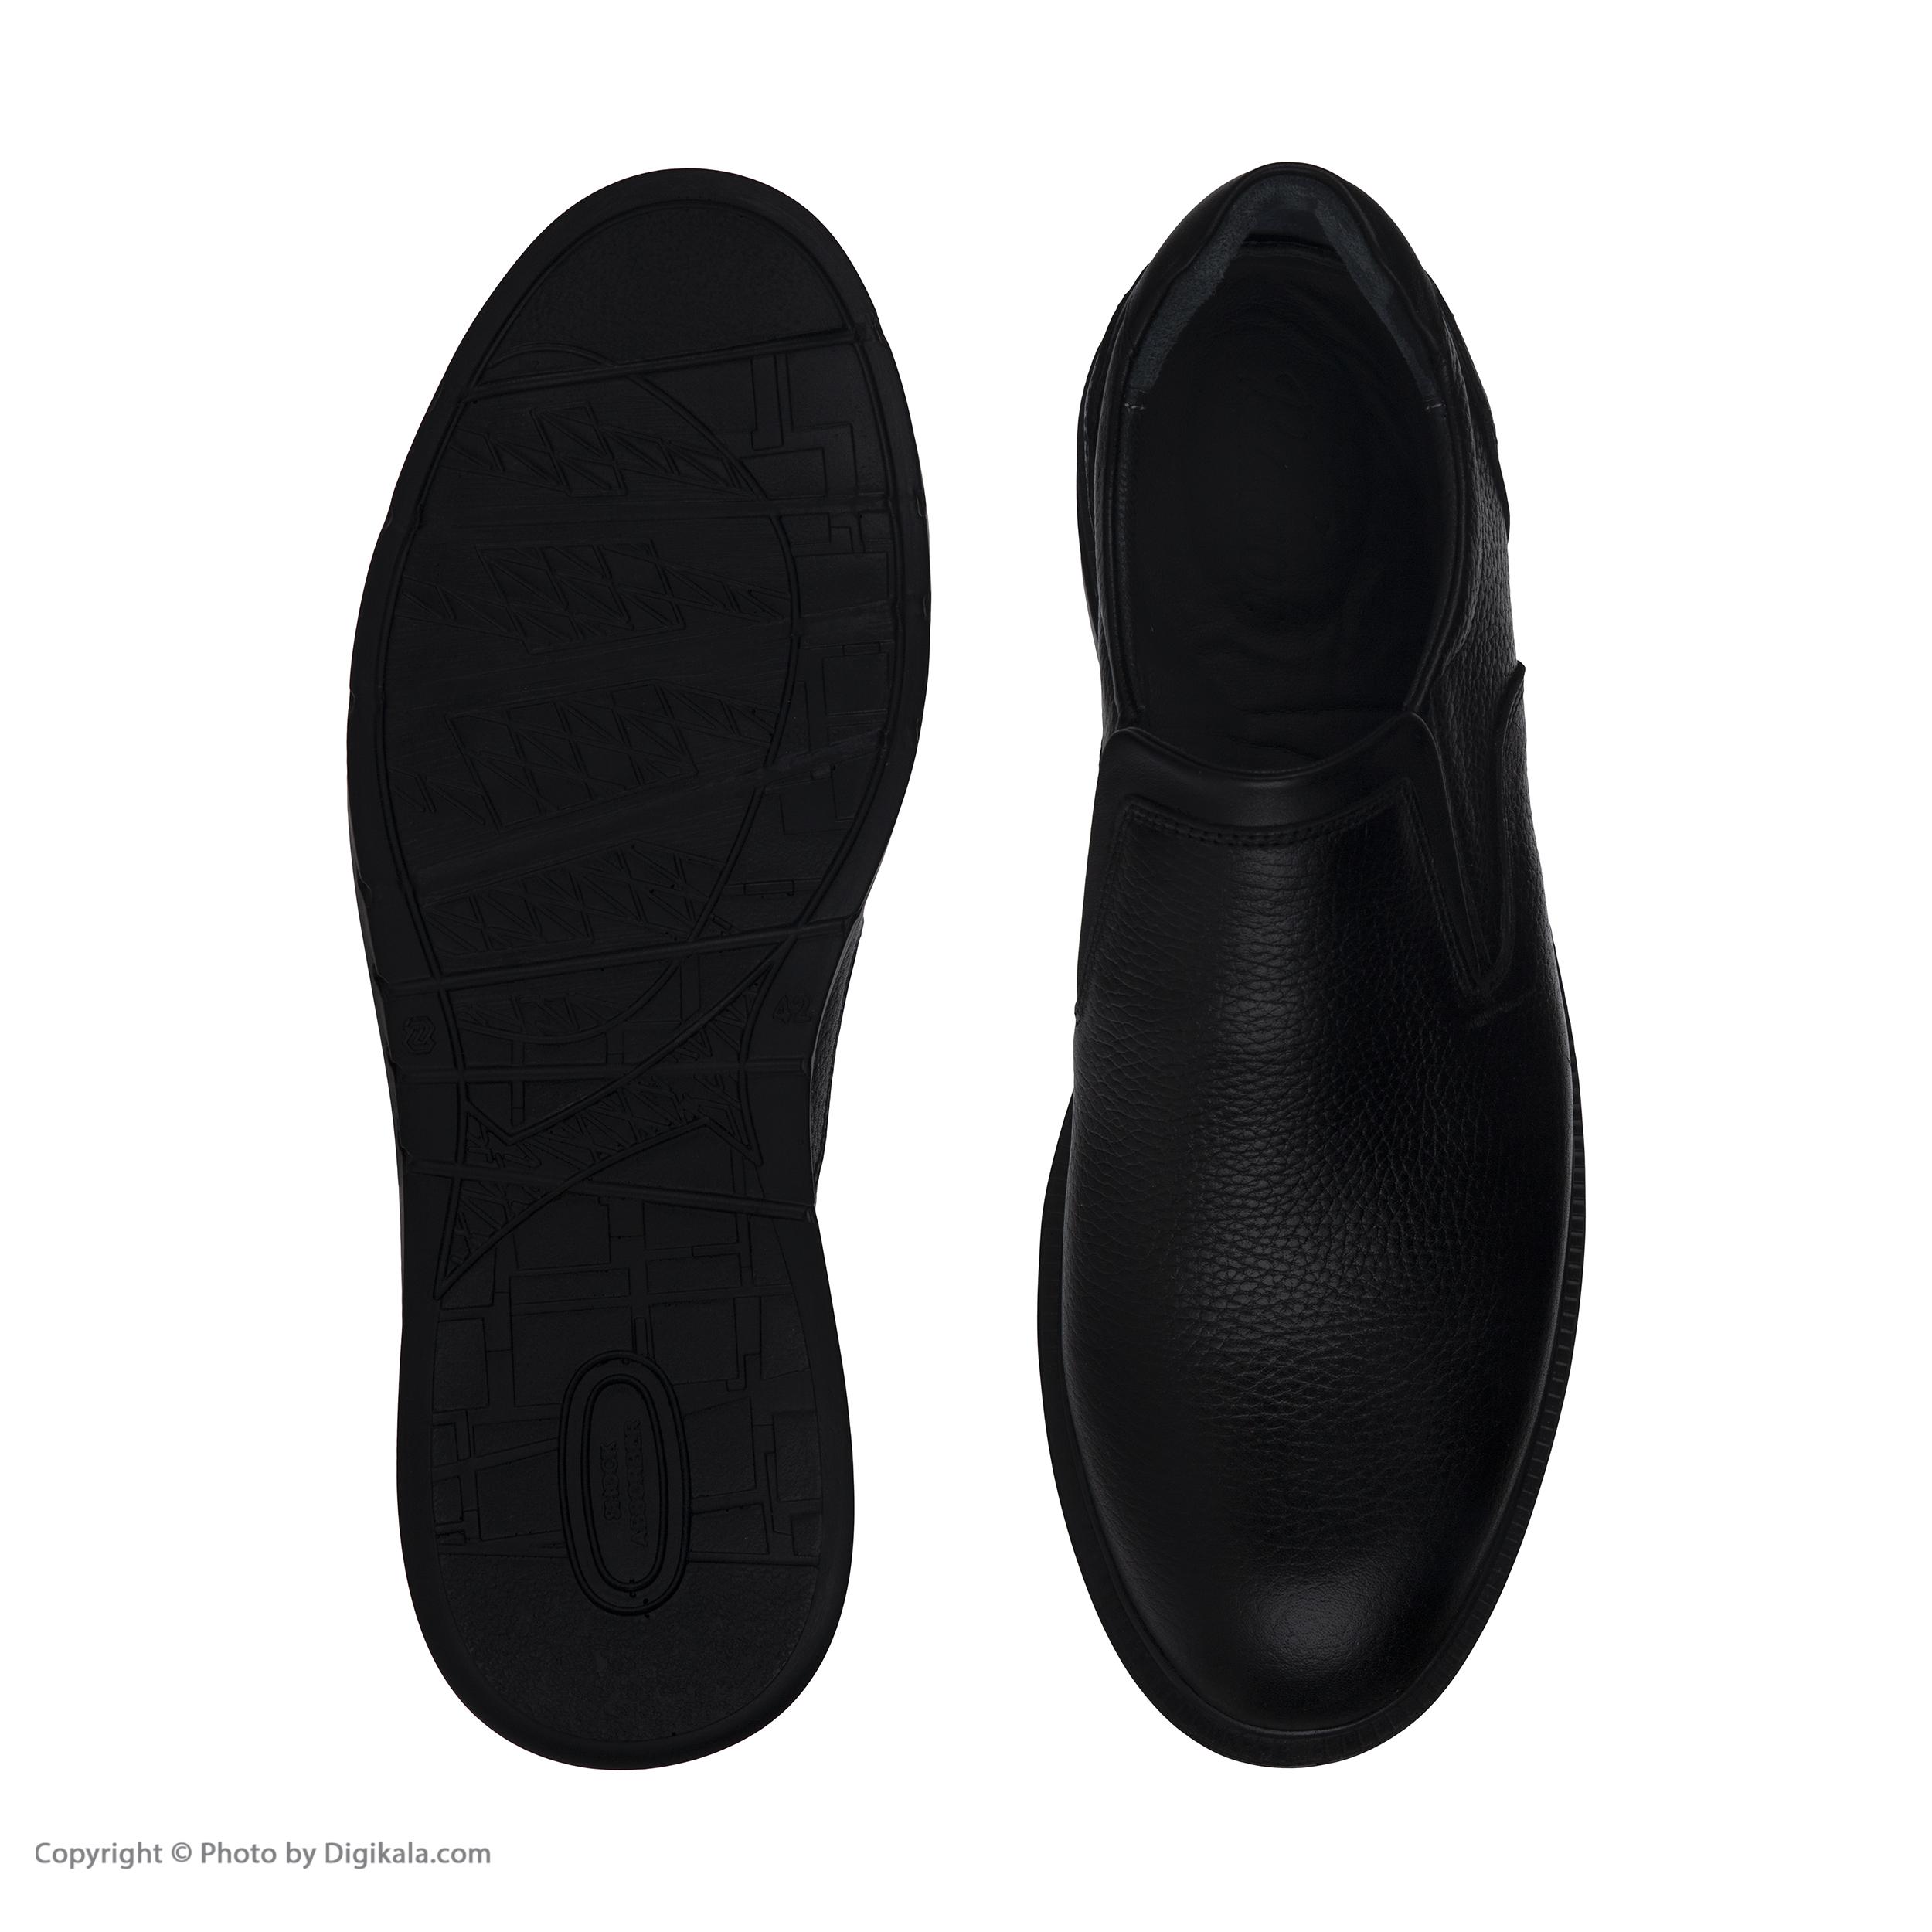 کفش روزمره مردانه بلوط مدل 7240C503101 -  - 4